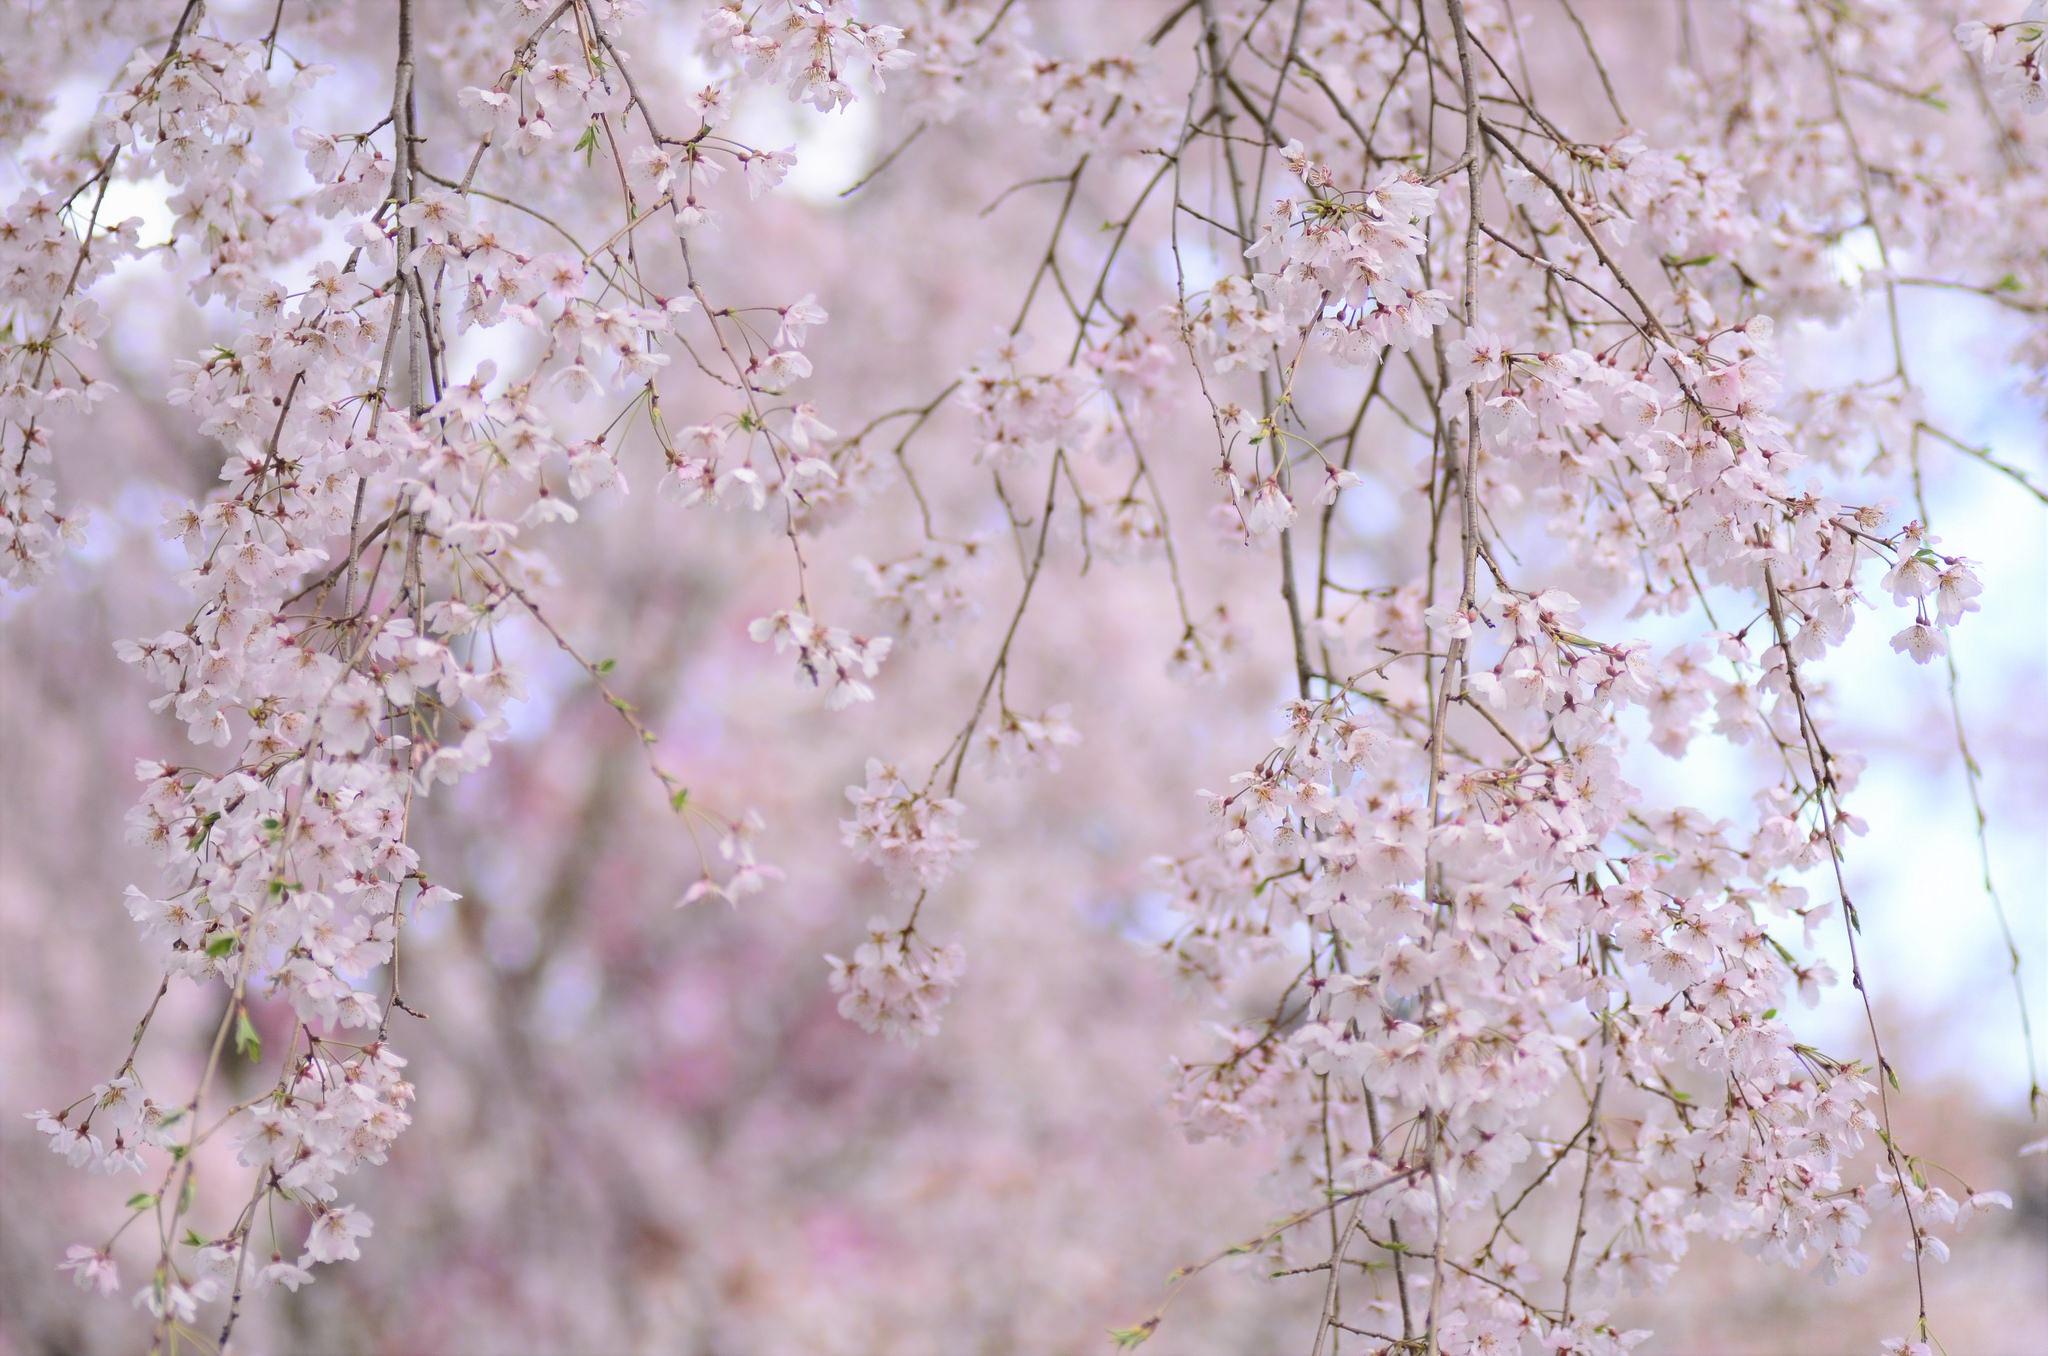 гифки красивые картинки цветение веточки вот